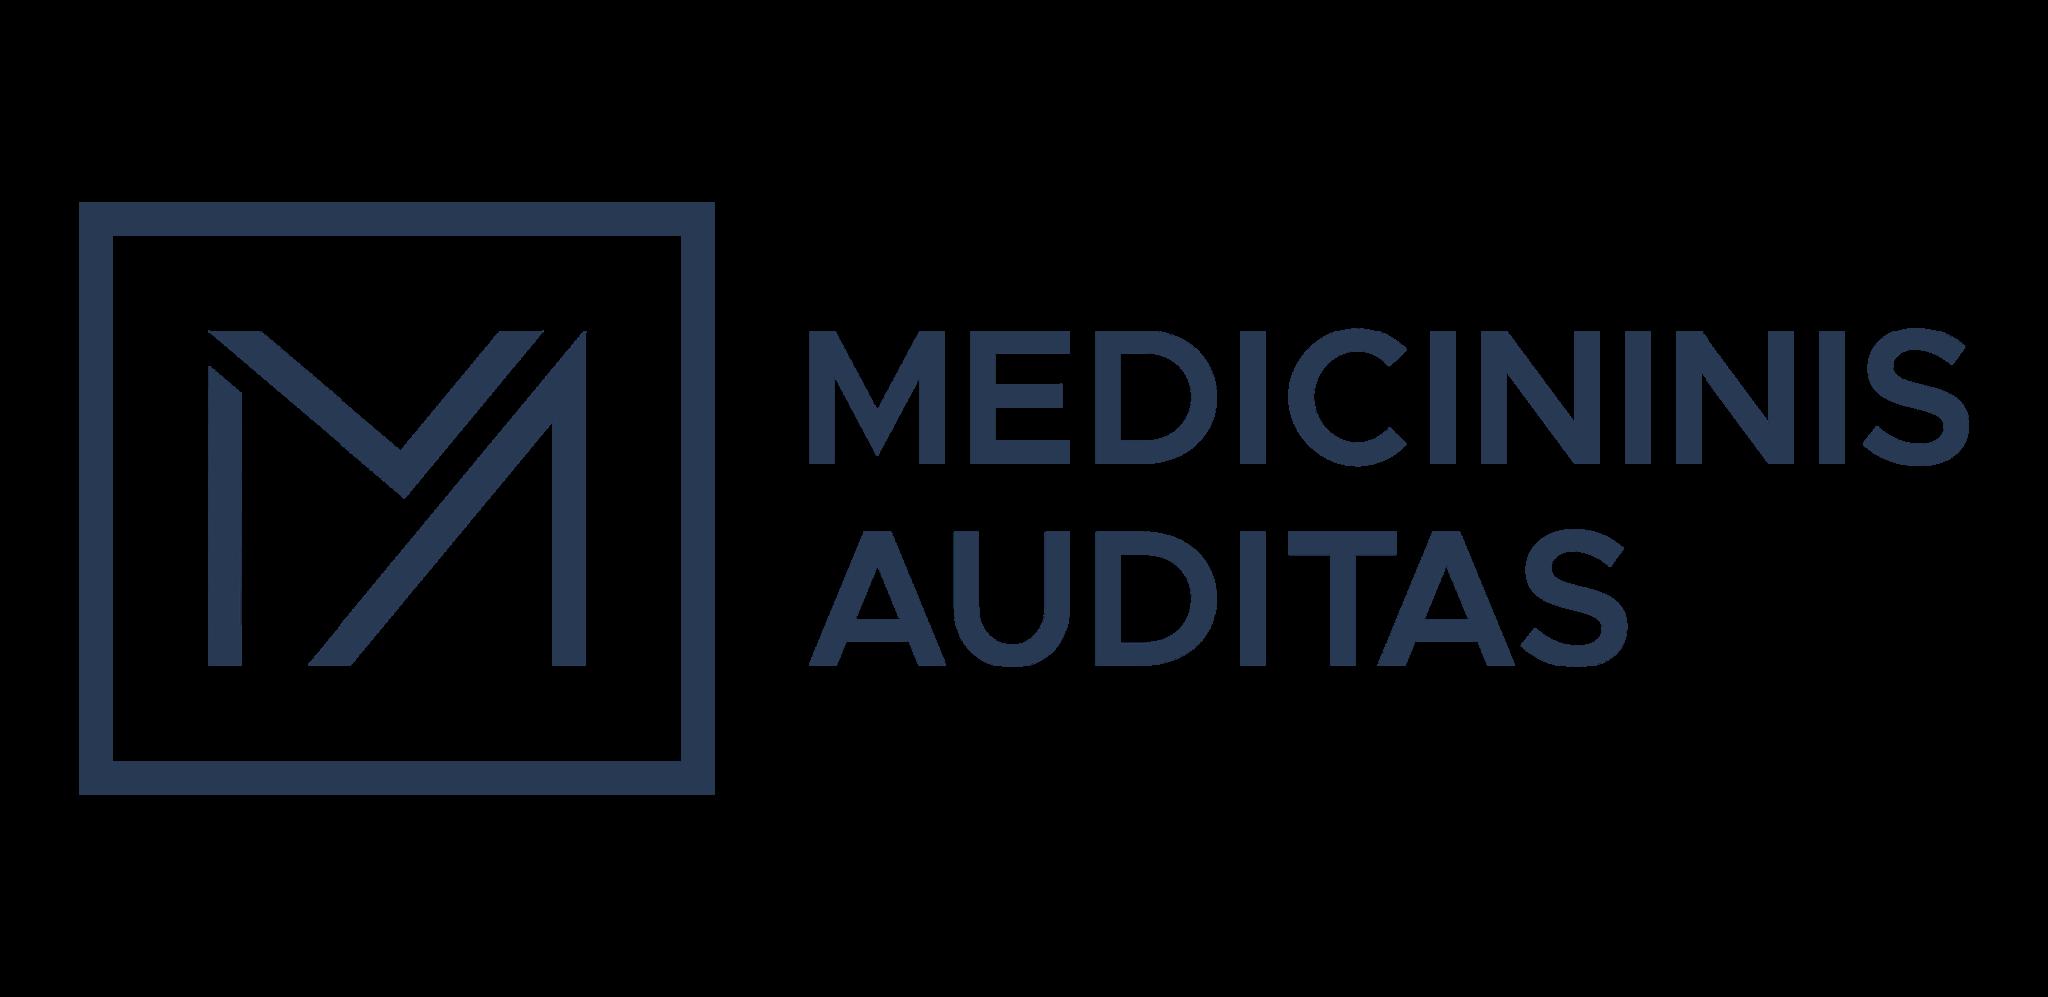 medicininis auditas